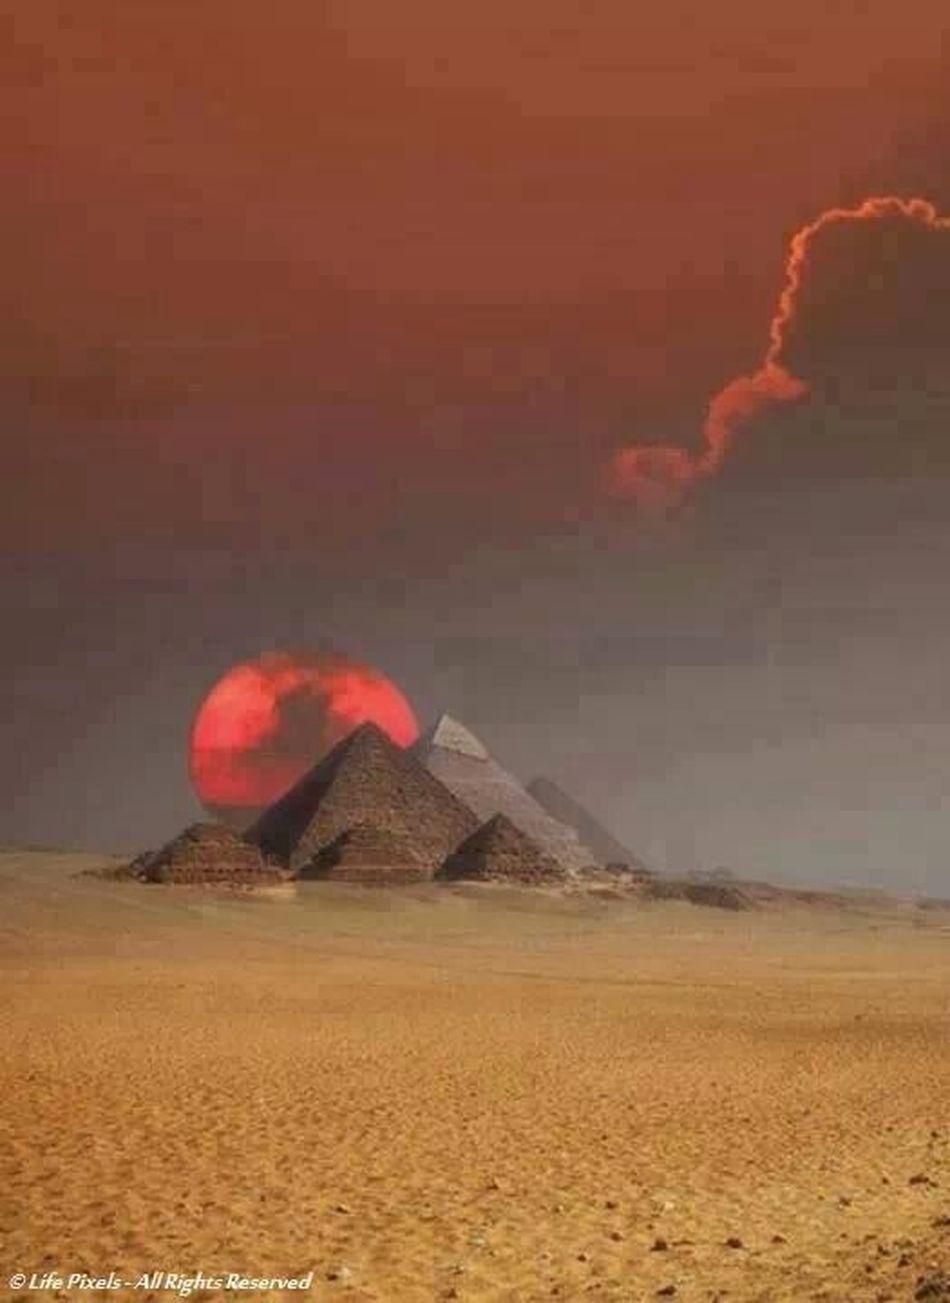 Egypt Piramide ❤❤❤❤ Piramide Beautiful Nature